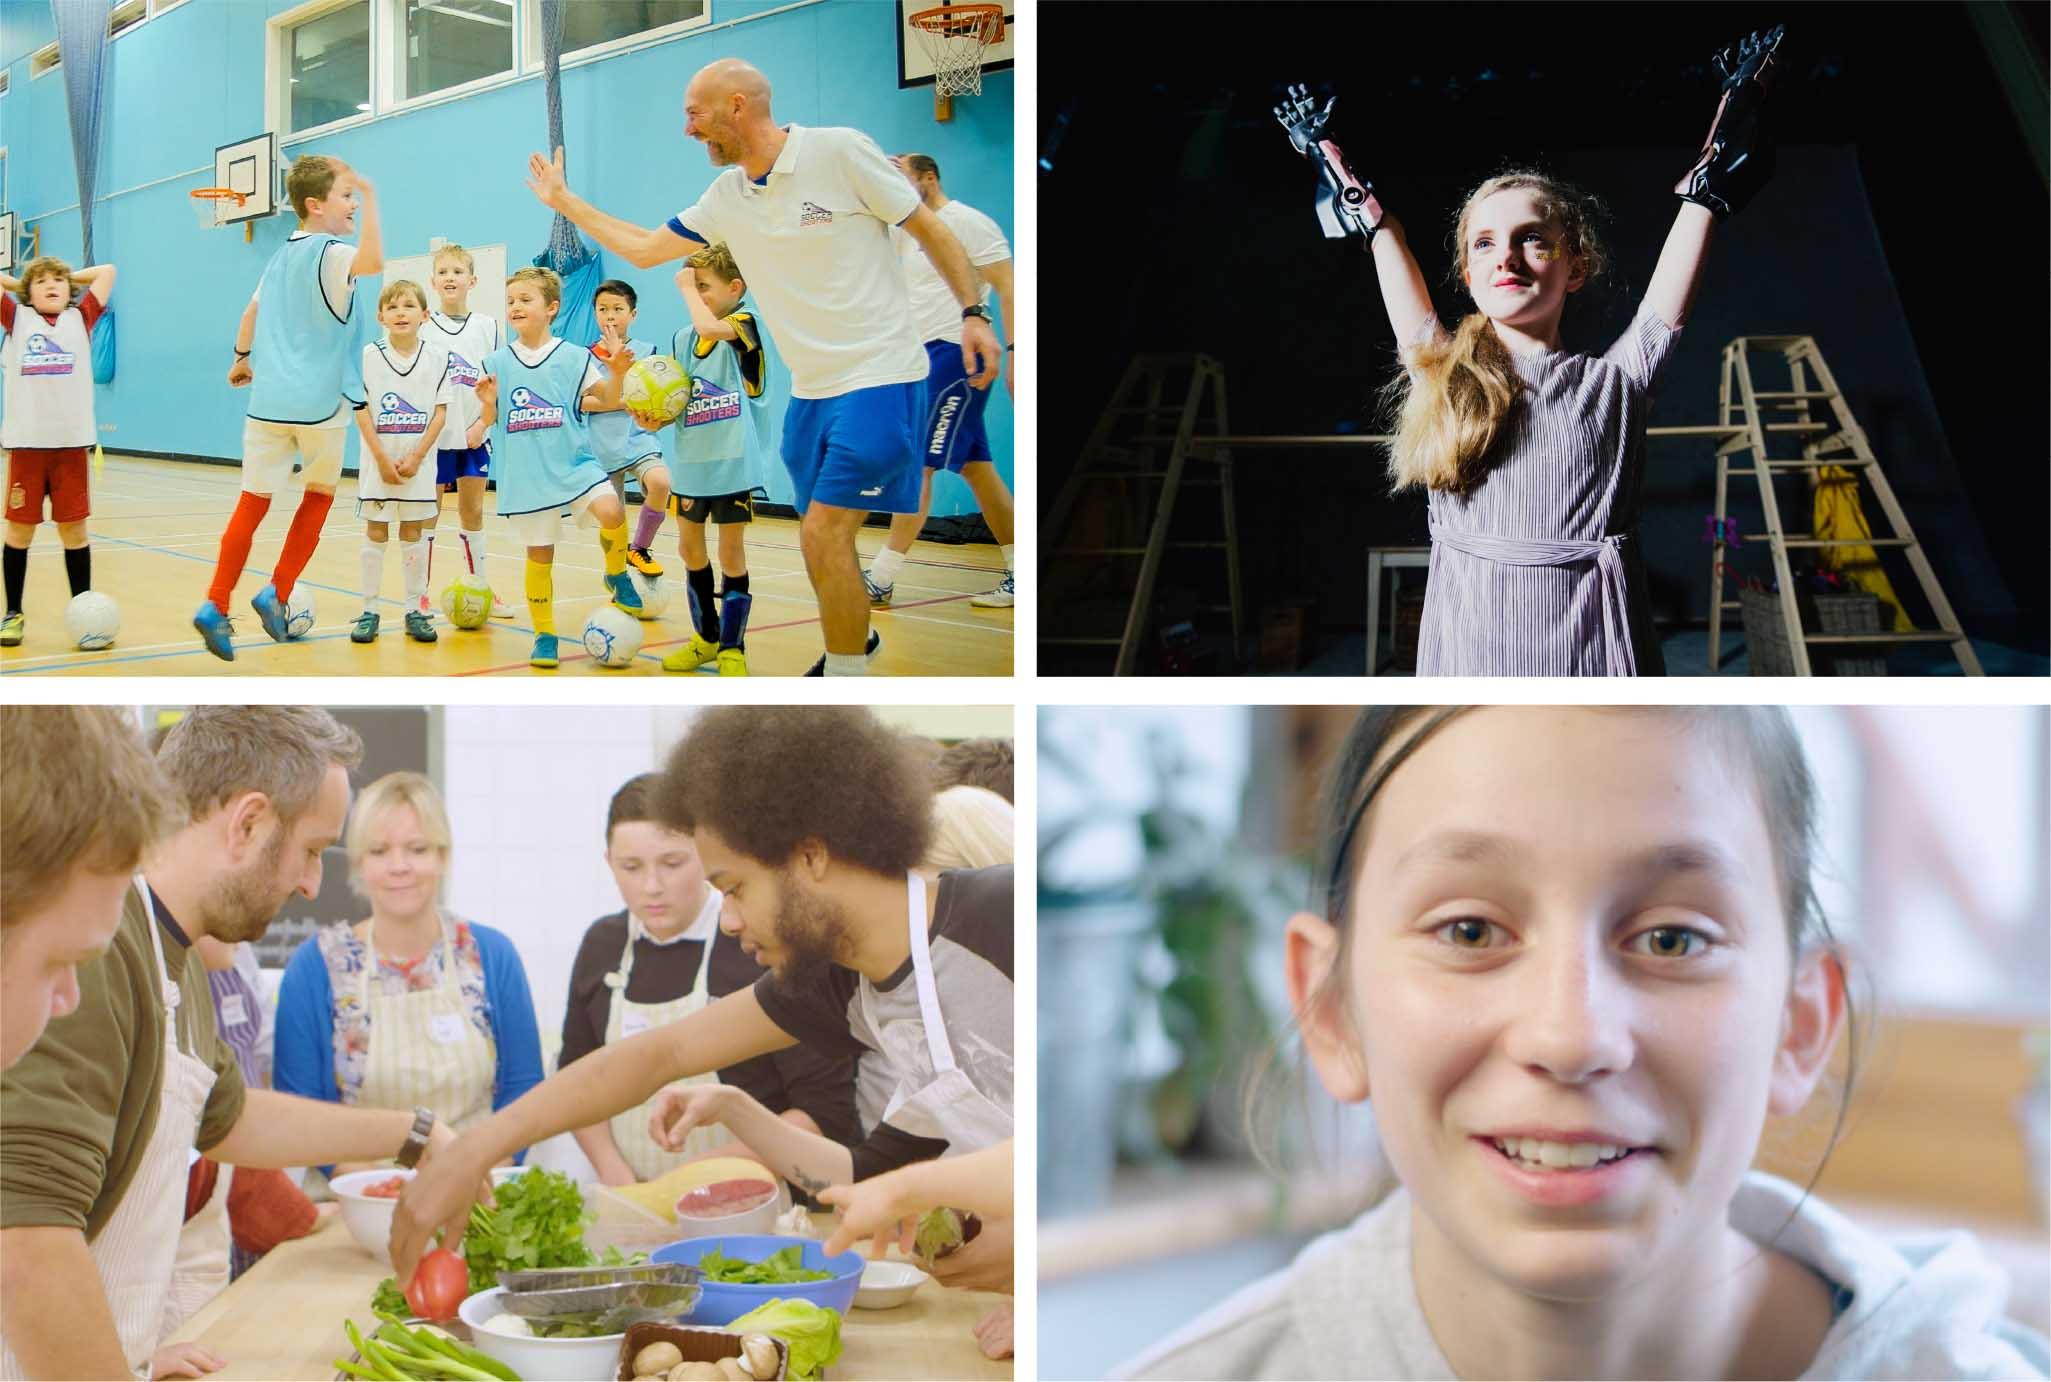 tusko-film-school-education-masterclass-video-production-company-startup-affordable-budget